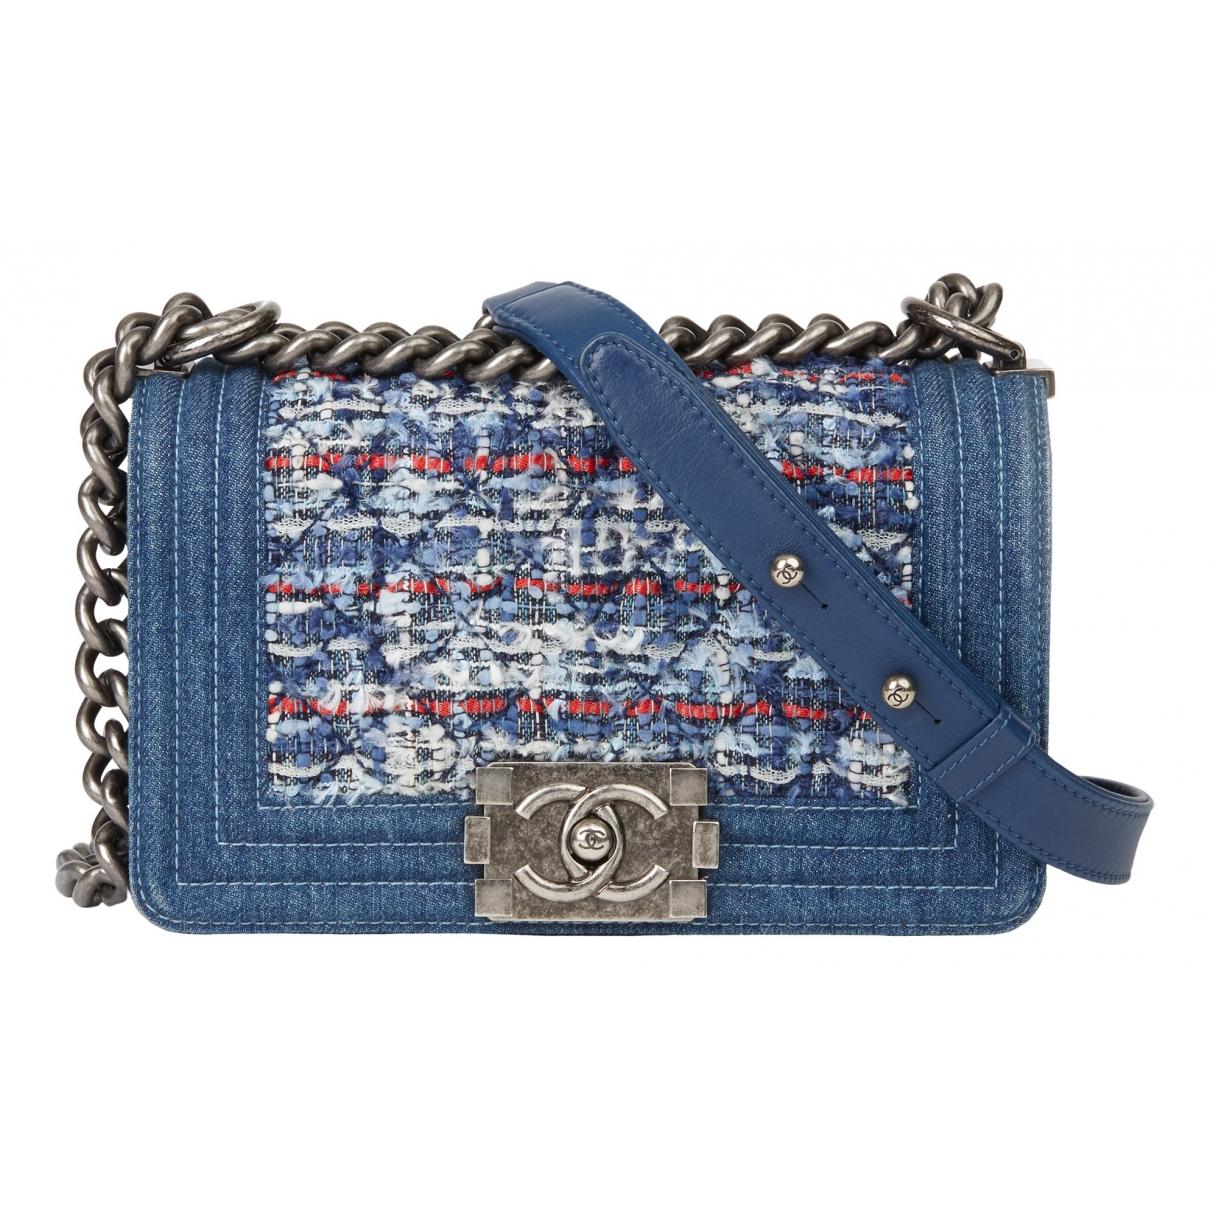 Chanel - Sac a main Boy pour femme en tweed - bleu